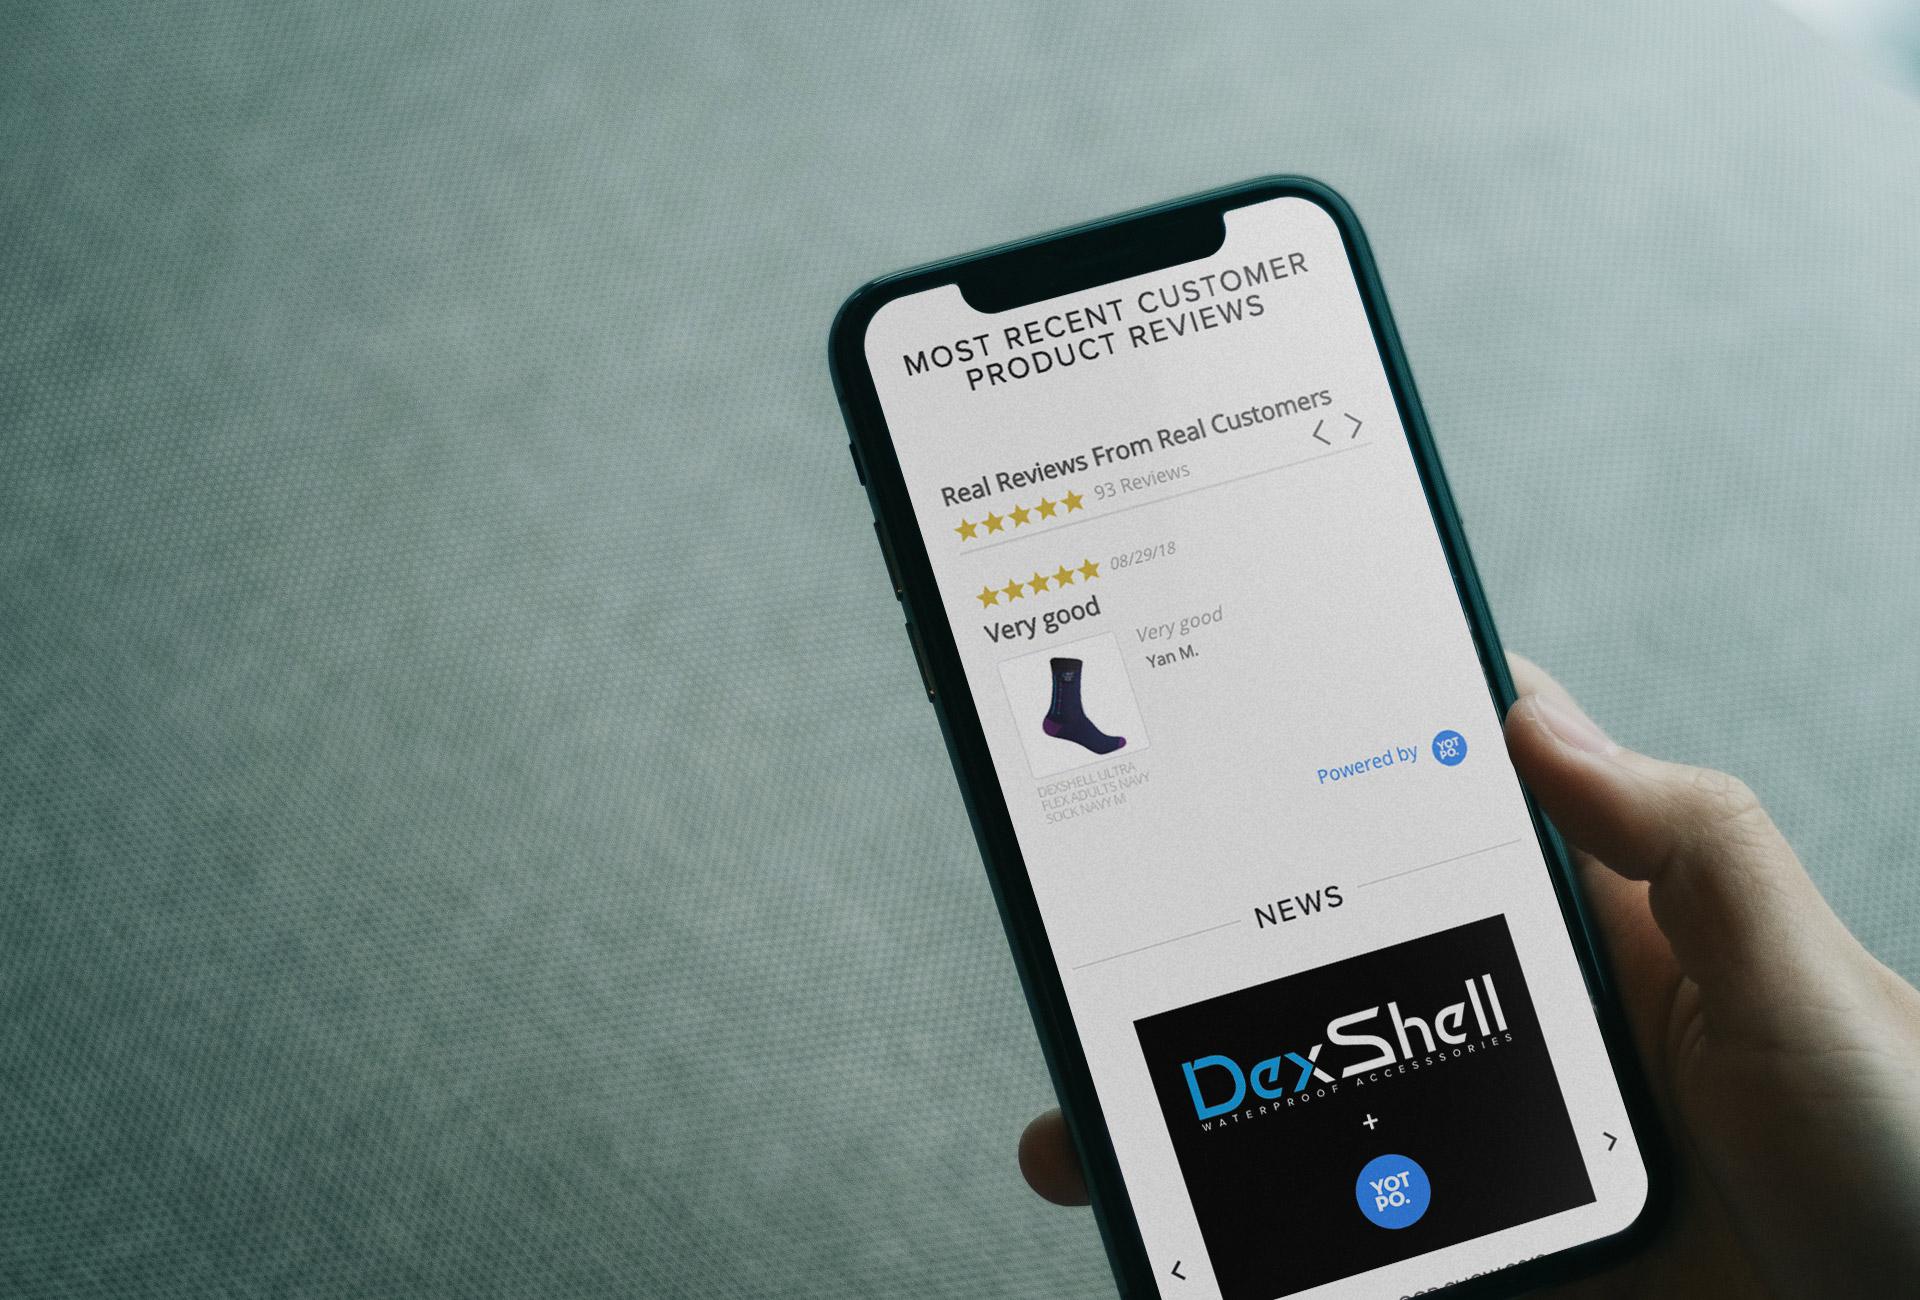 Dexshell Yotpo review on a mobile device